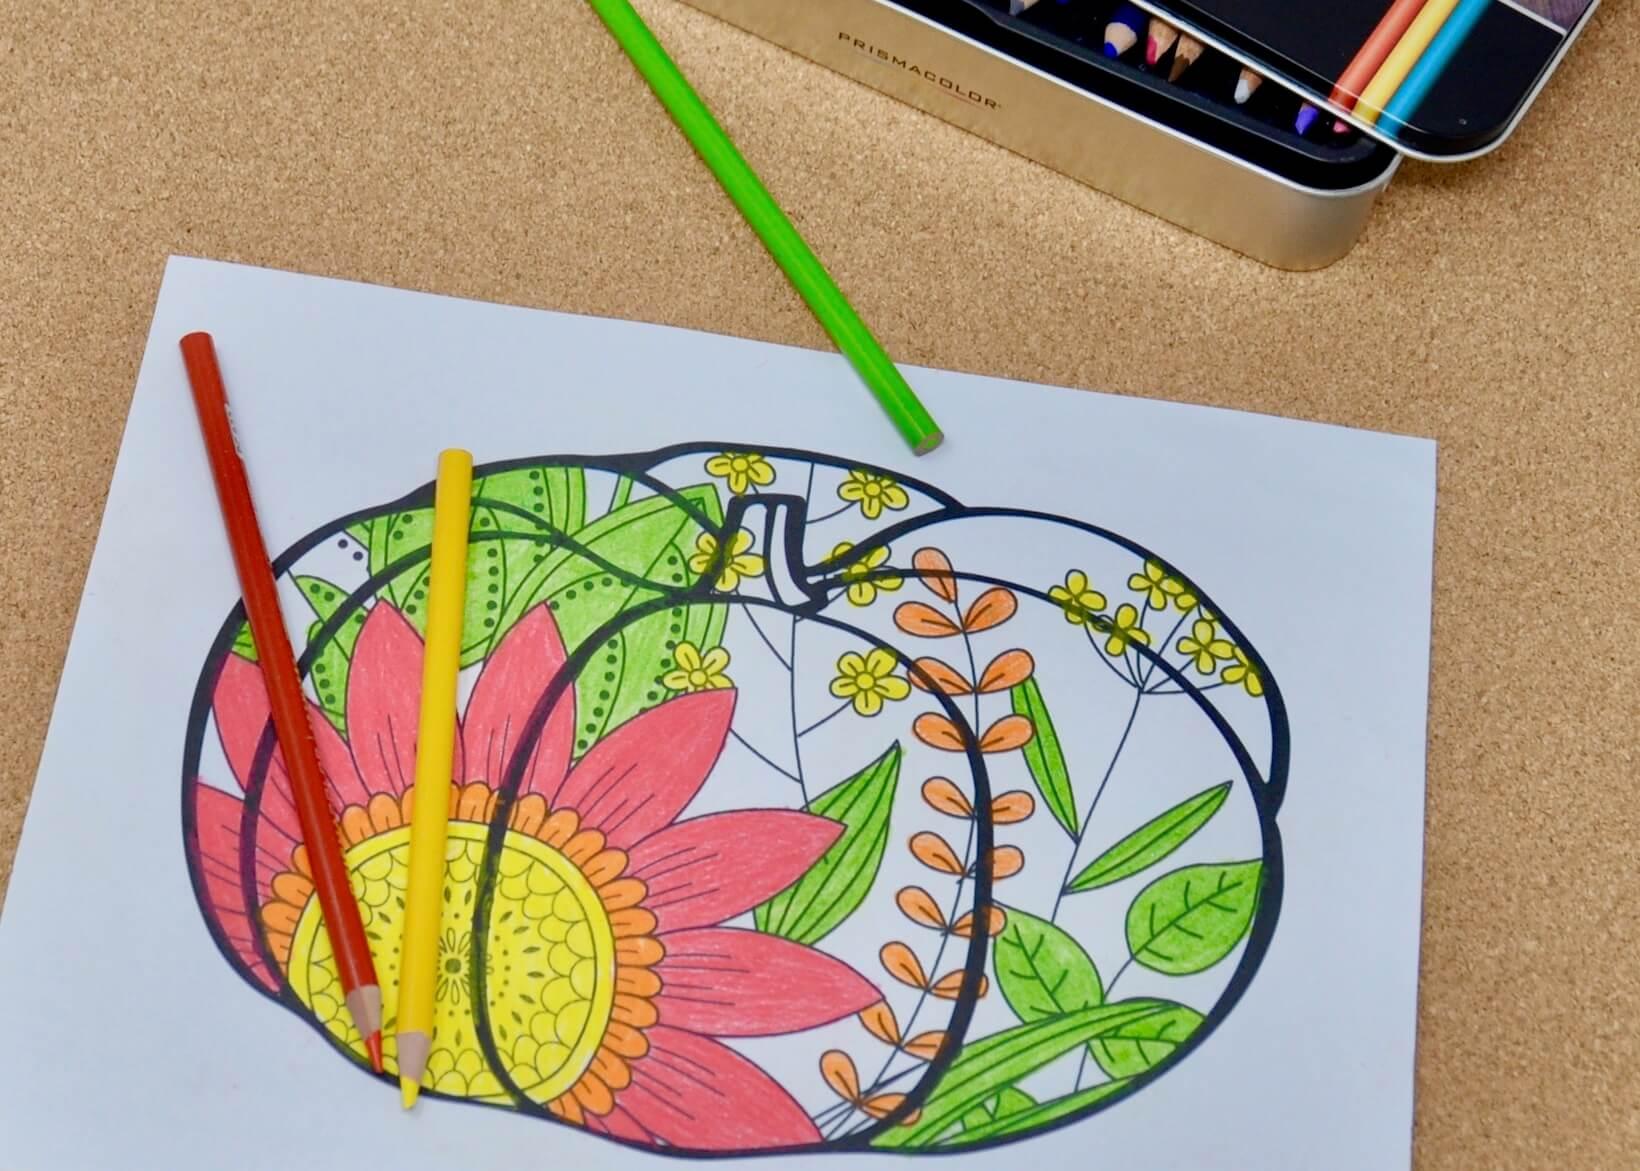 Simplified zentangle pumpkin colored by dementia patient.